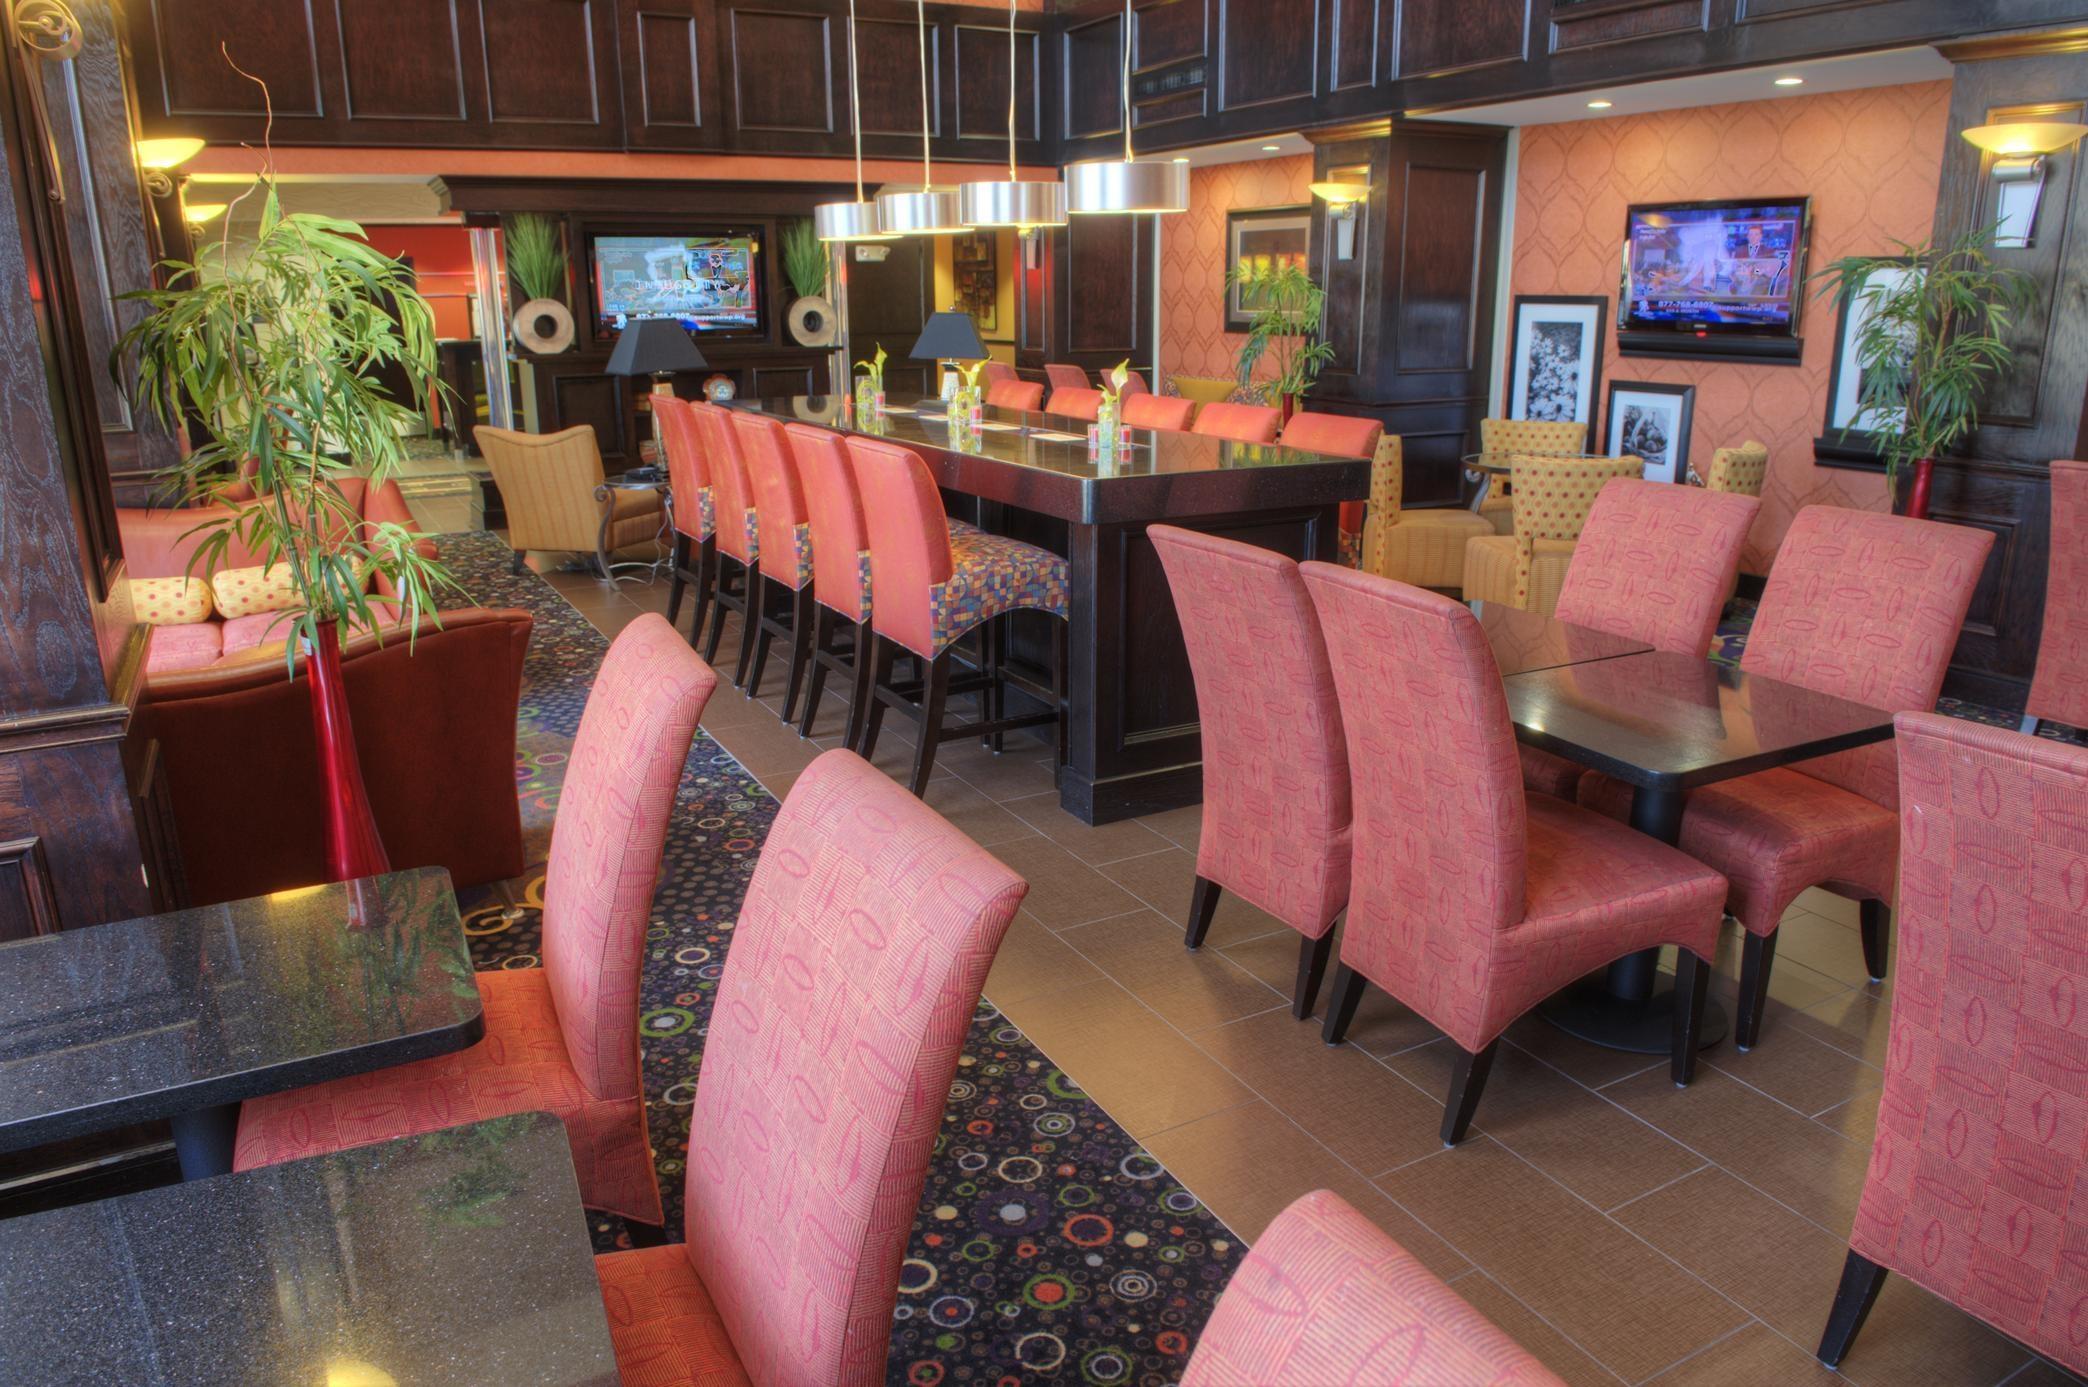 Hampton Inn & Suites Dallas/Lewisville-Vista Ridge Mall, TX image 6